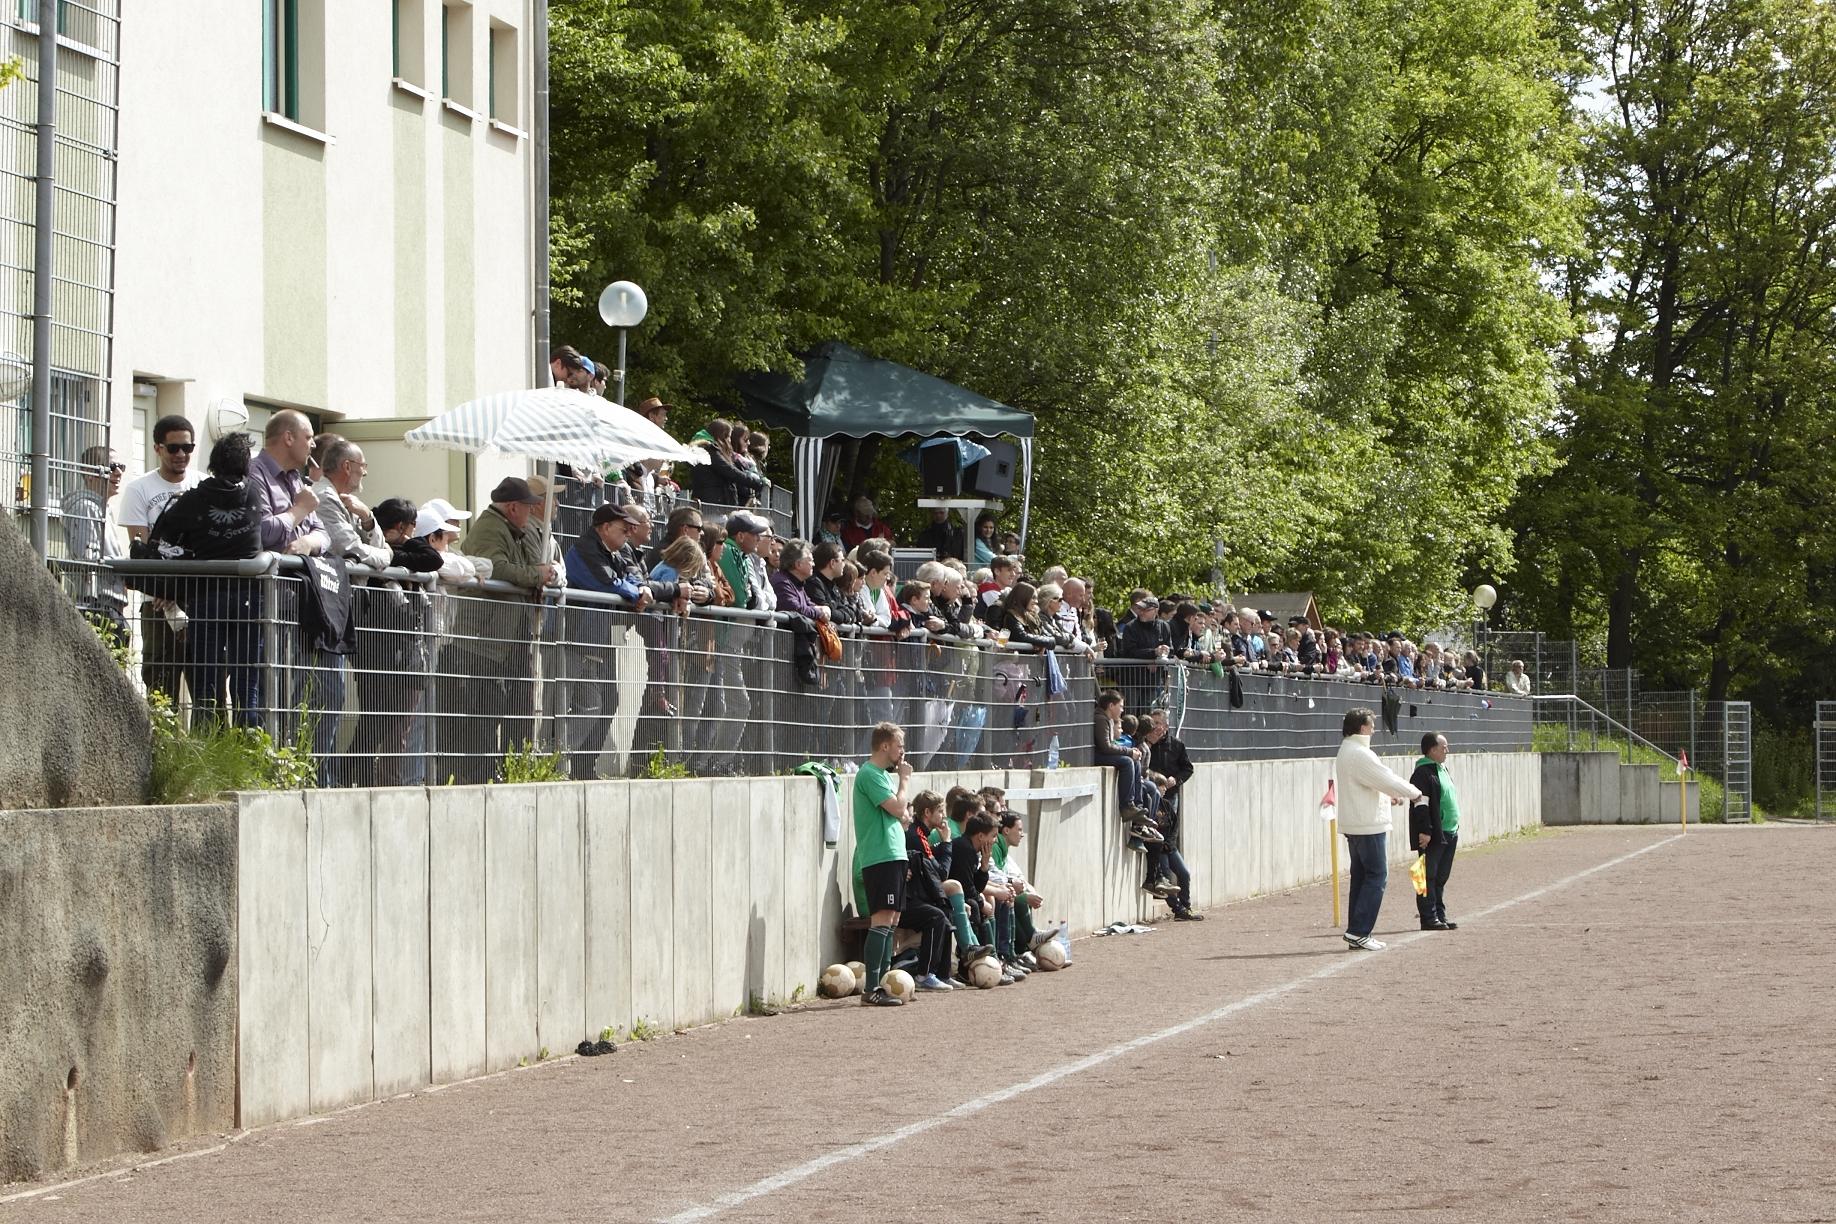 Sportplatz-Fans.jpg